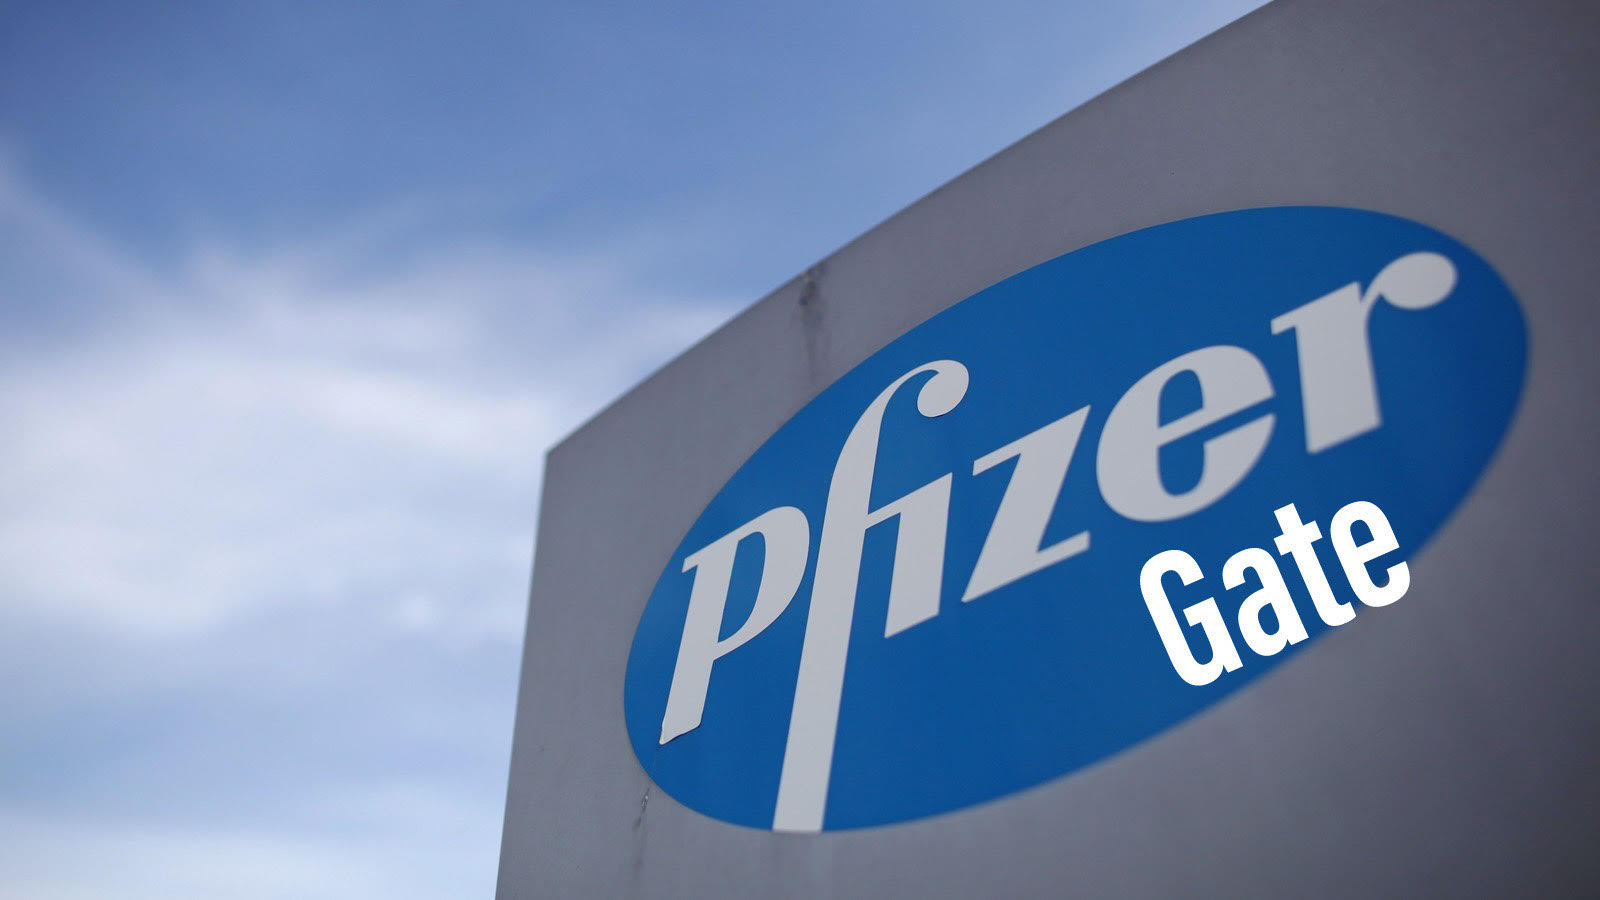 PfizerGate, Corrupción en Pfizer, Corrupción en Argentina, Ginés González García, Alberto Fernández